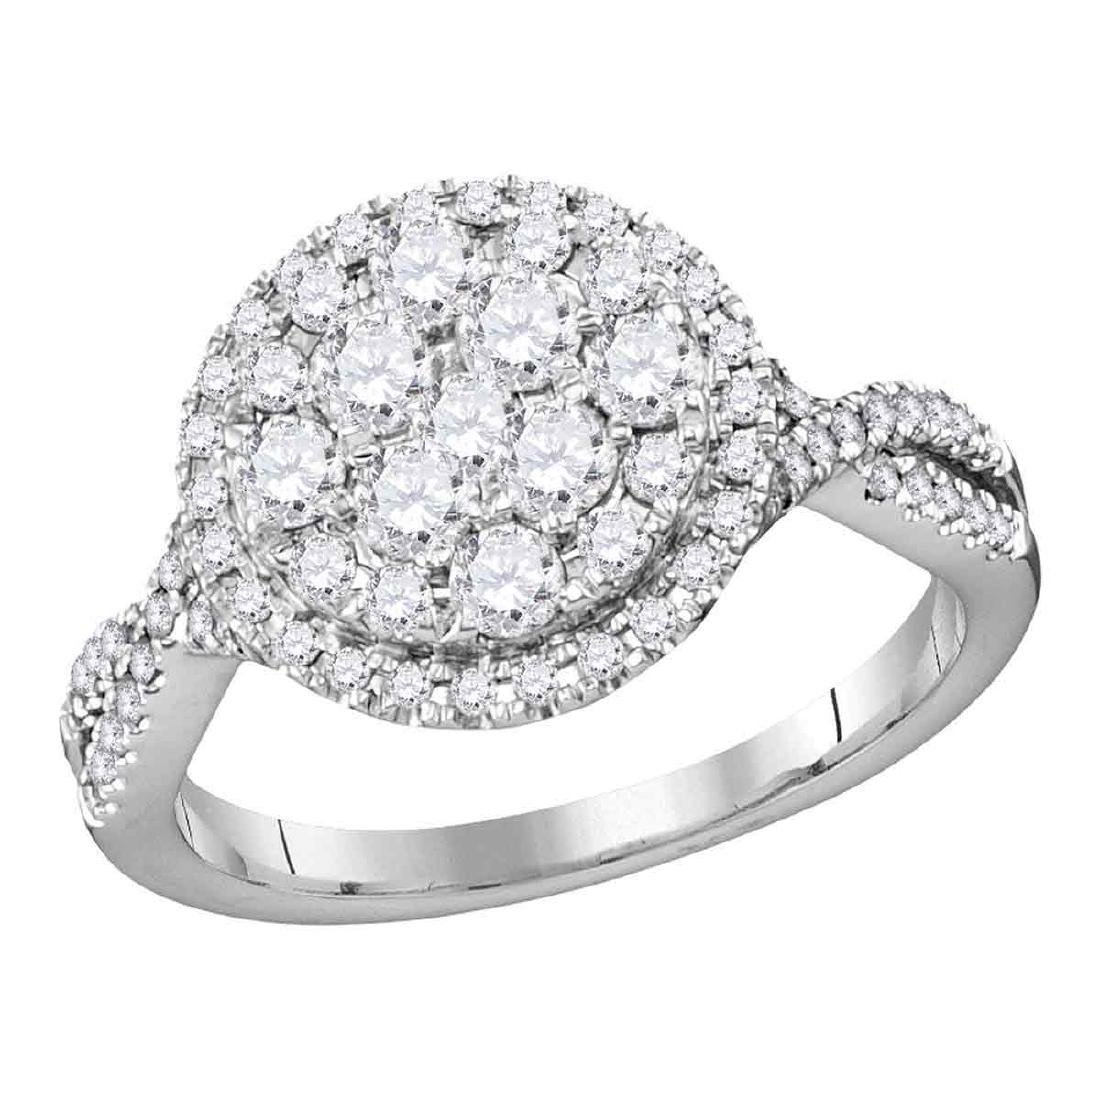 1.02 CTW Diamond Cluster Bridal Engagement Ring 14KT